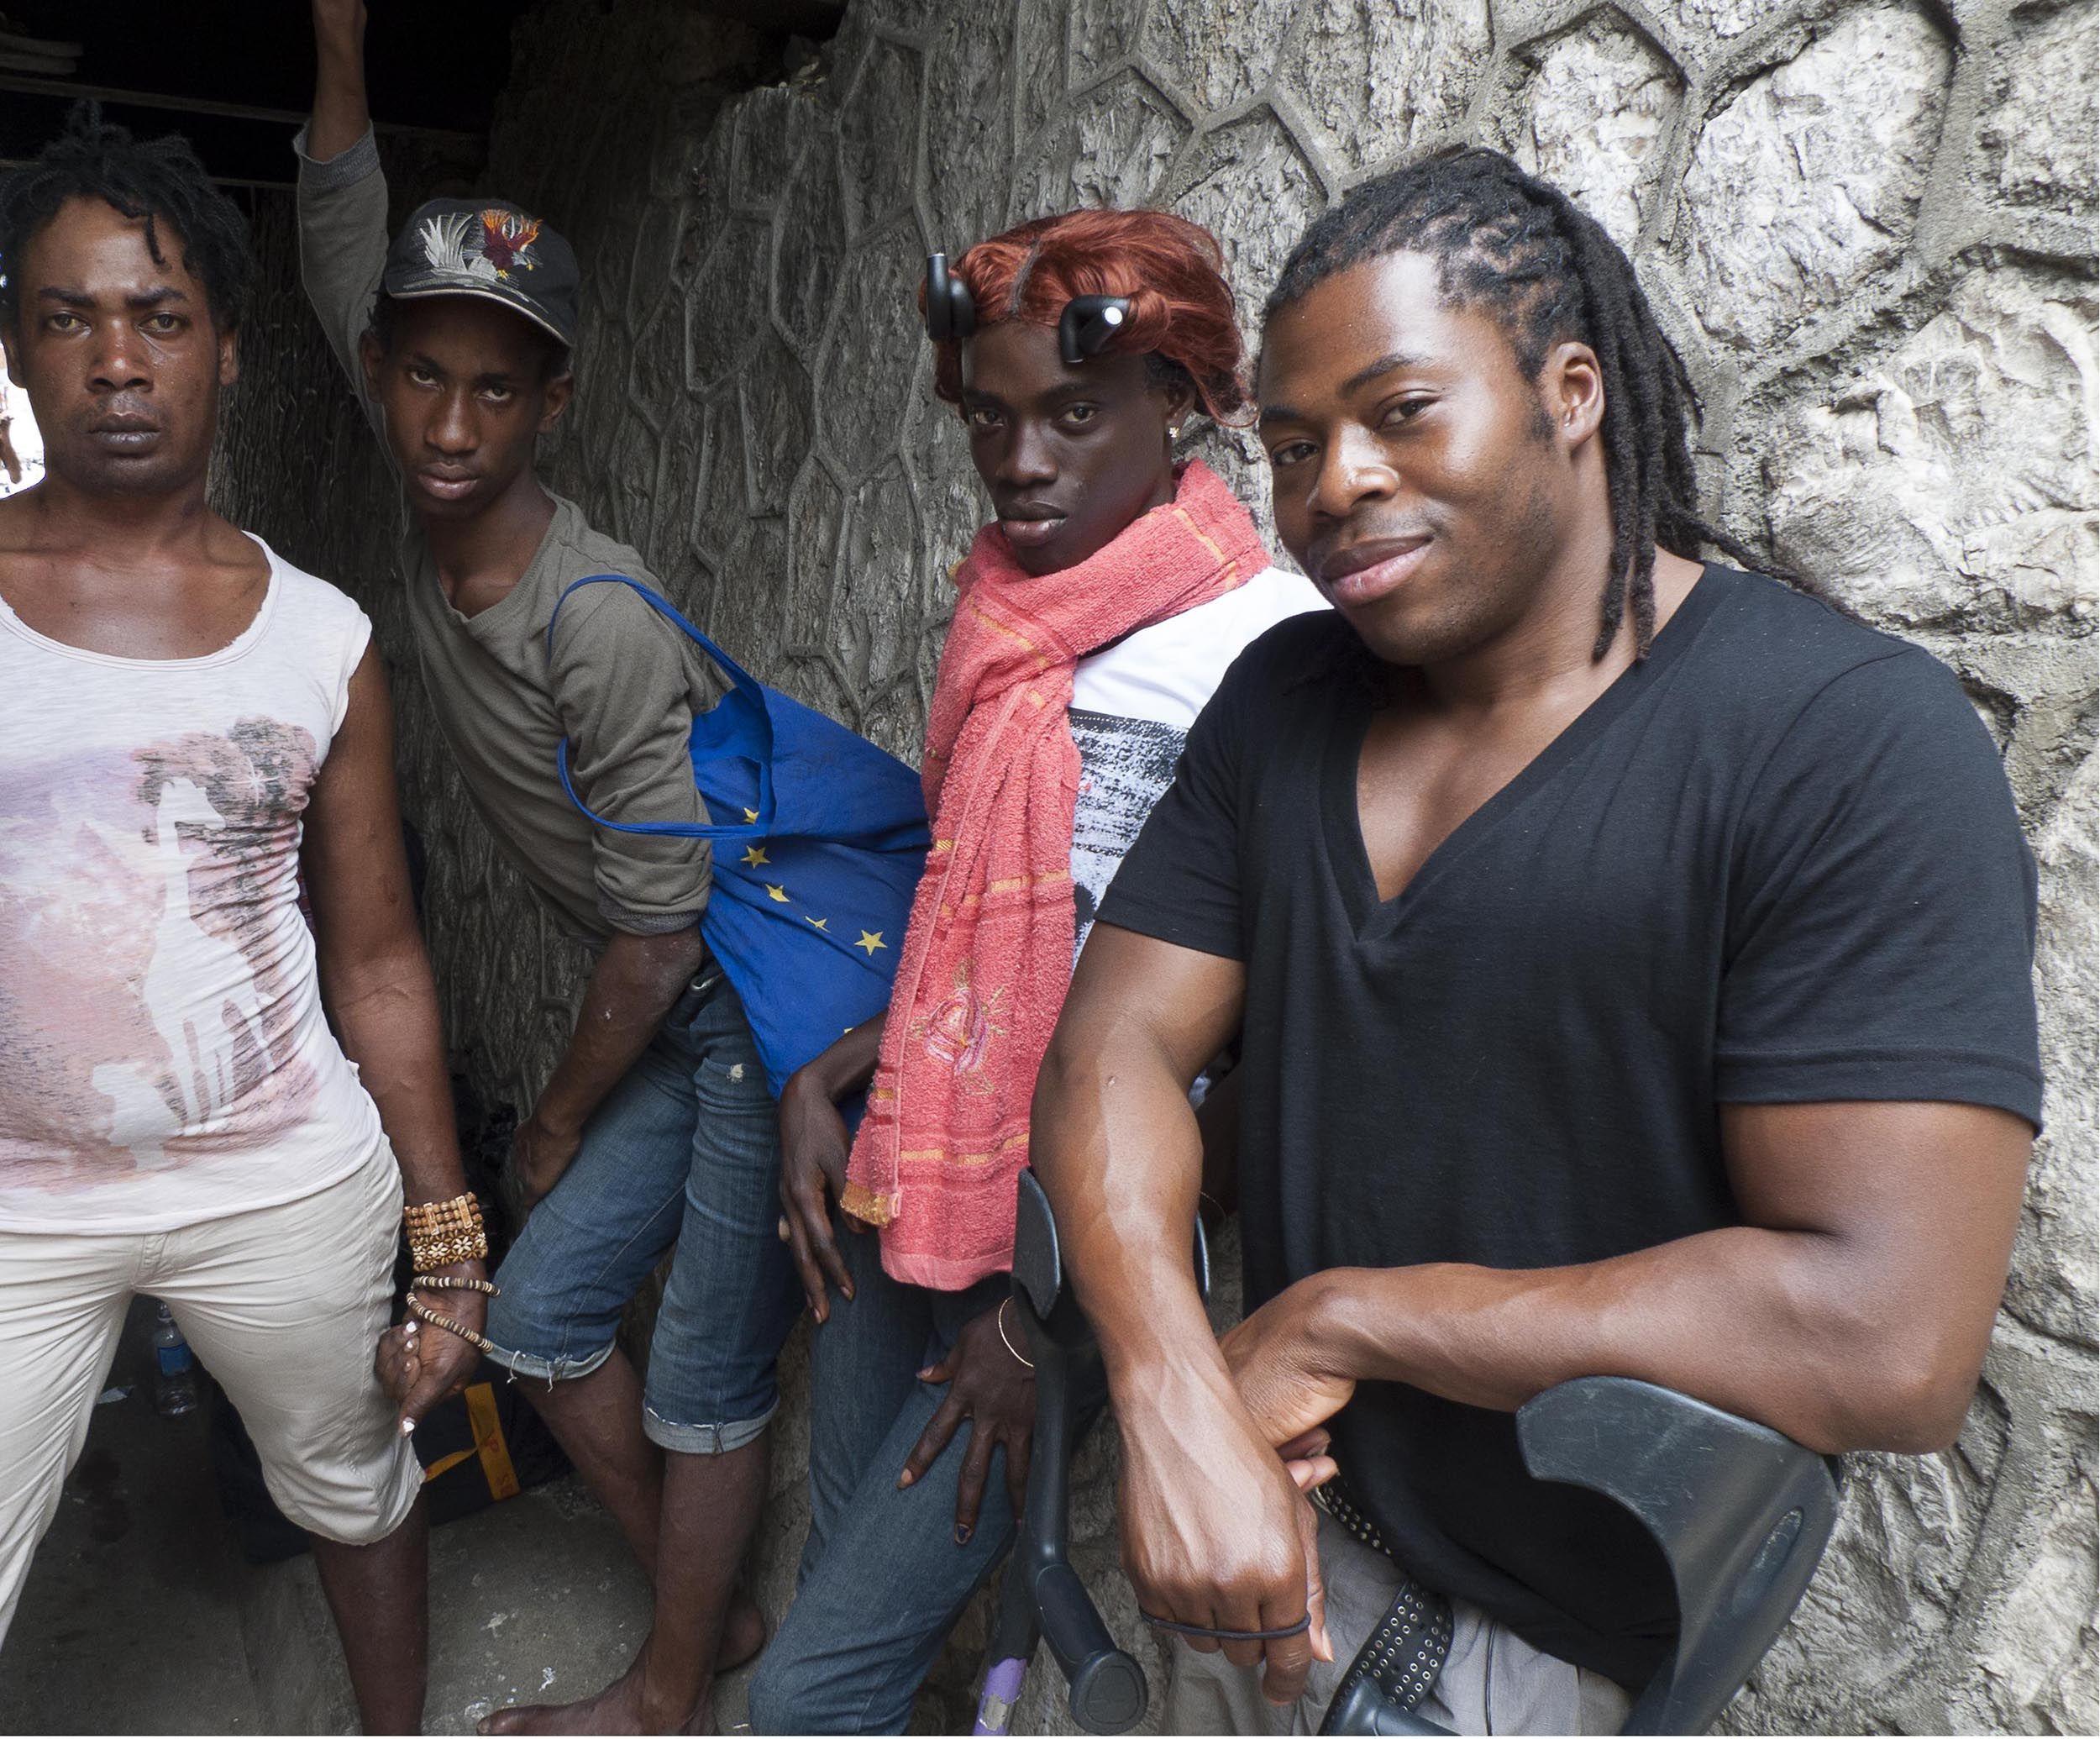 Homosexuality in jamaica documentary